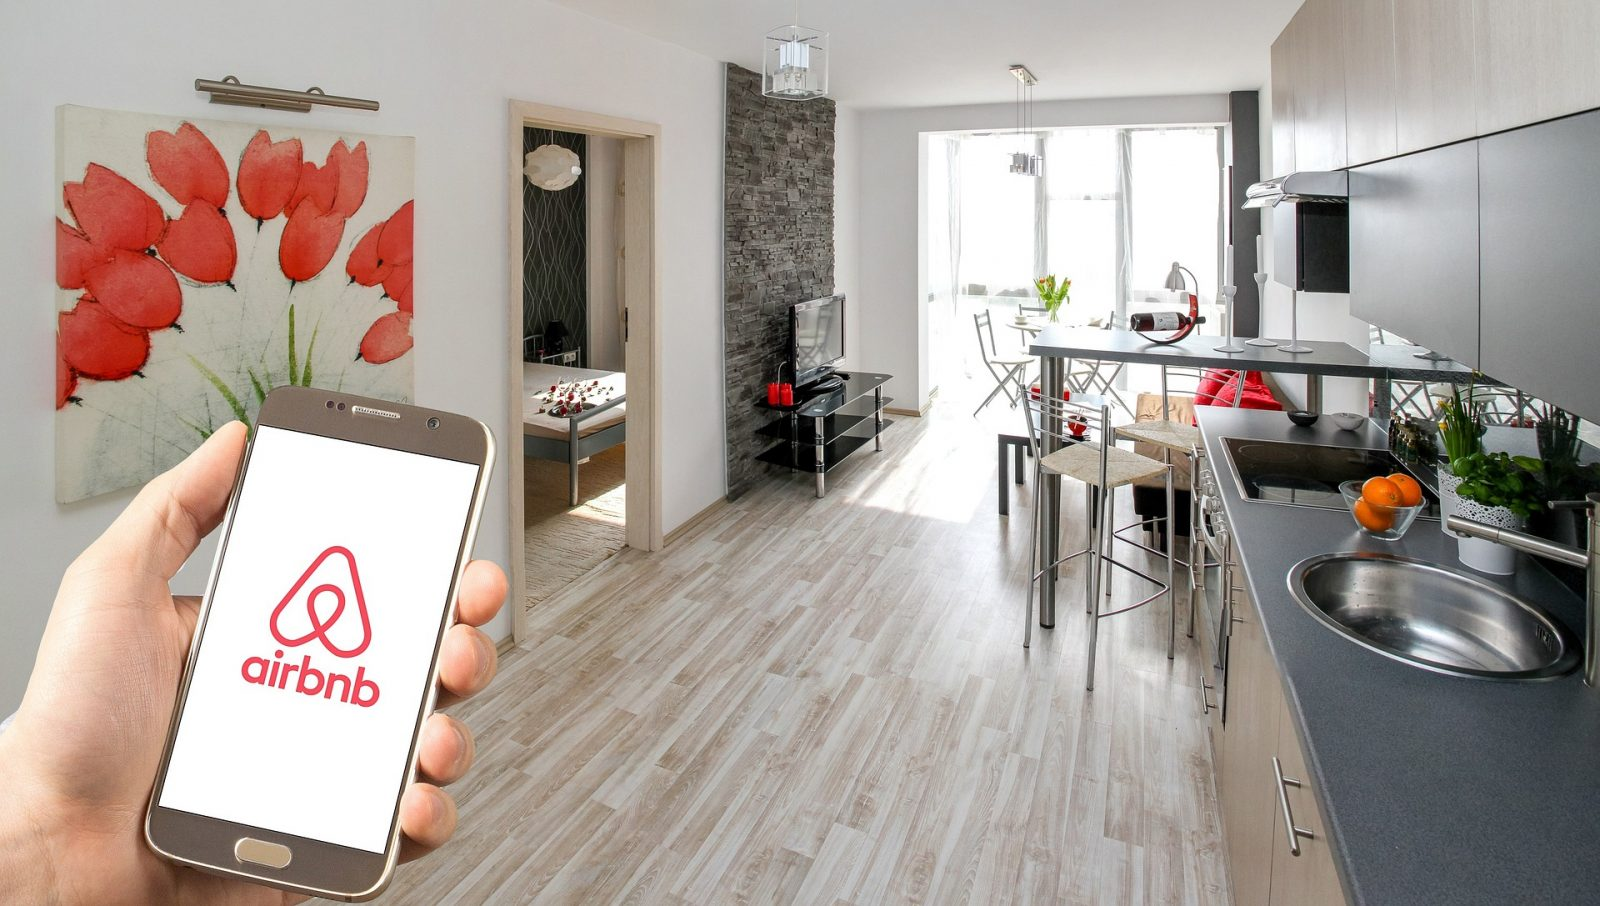 hosting airbnb